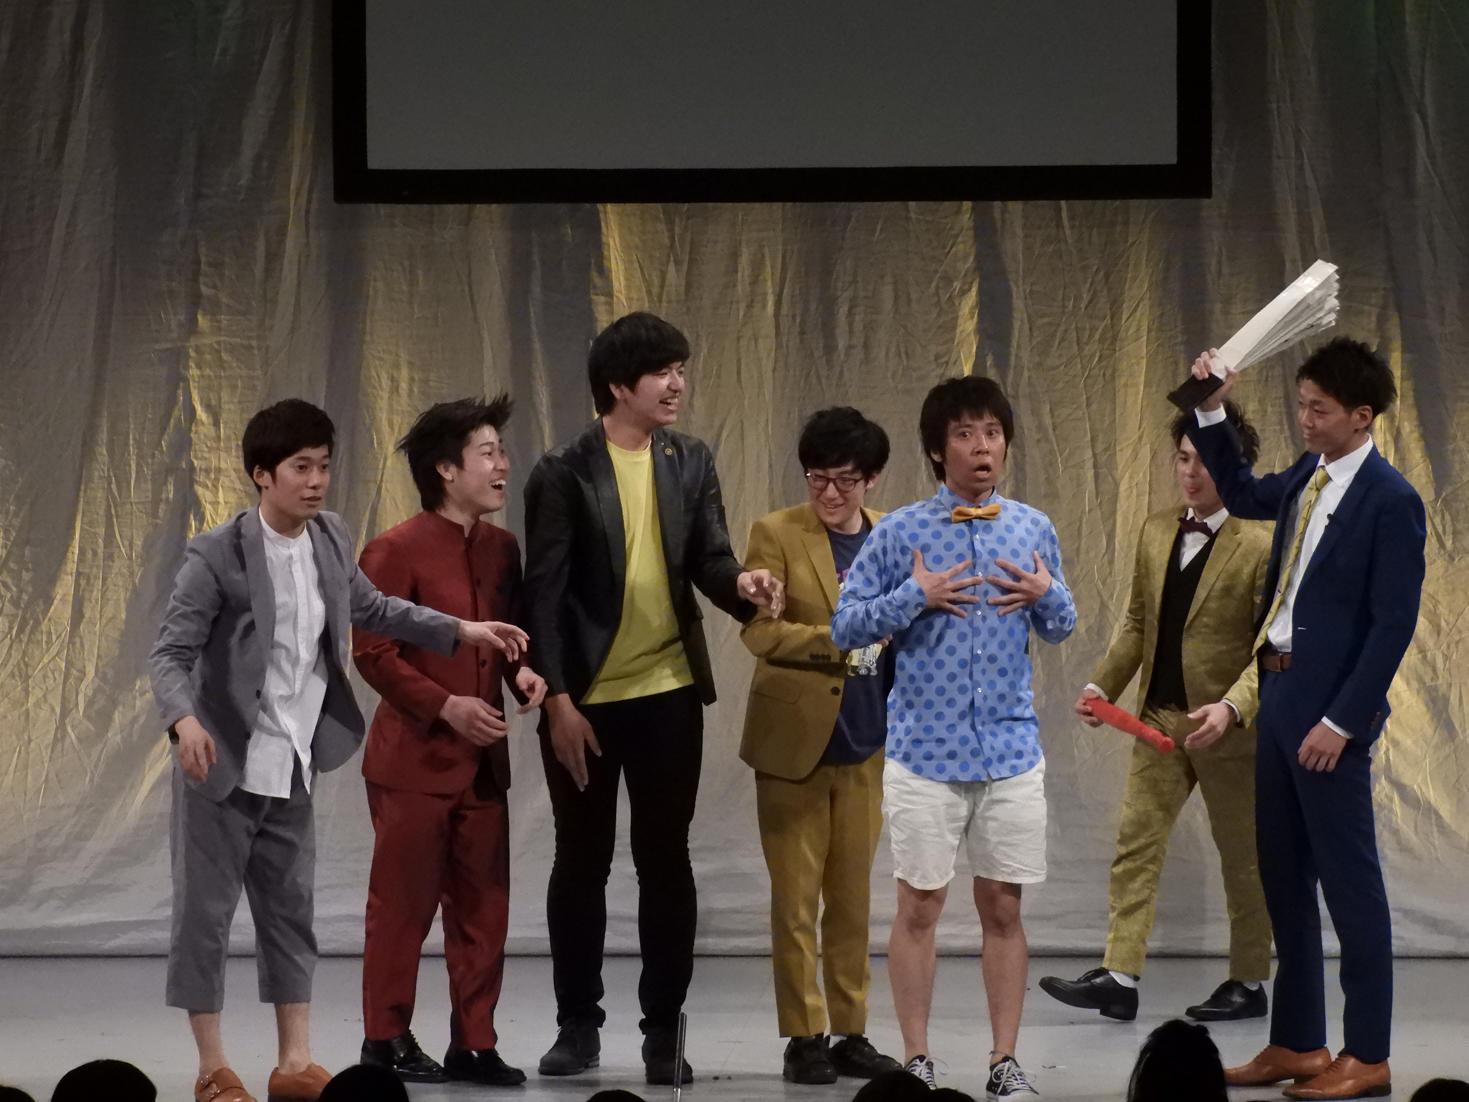 http://news.yoshimoto.co.jp/20180406112426-58f460e5ddbac3ce4cc587ba45eb0fc273ced381.jpg